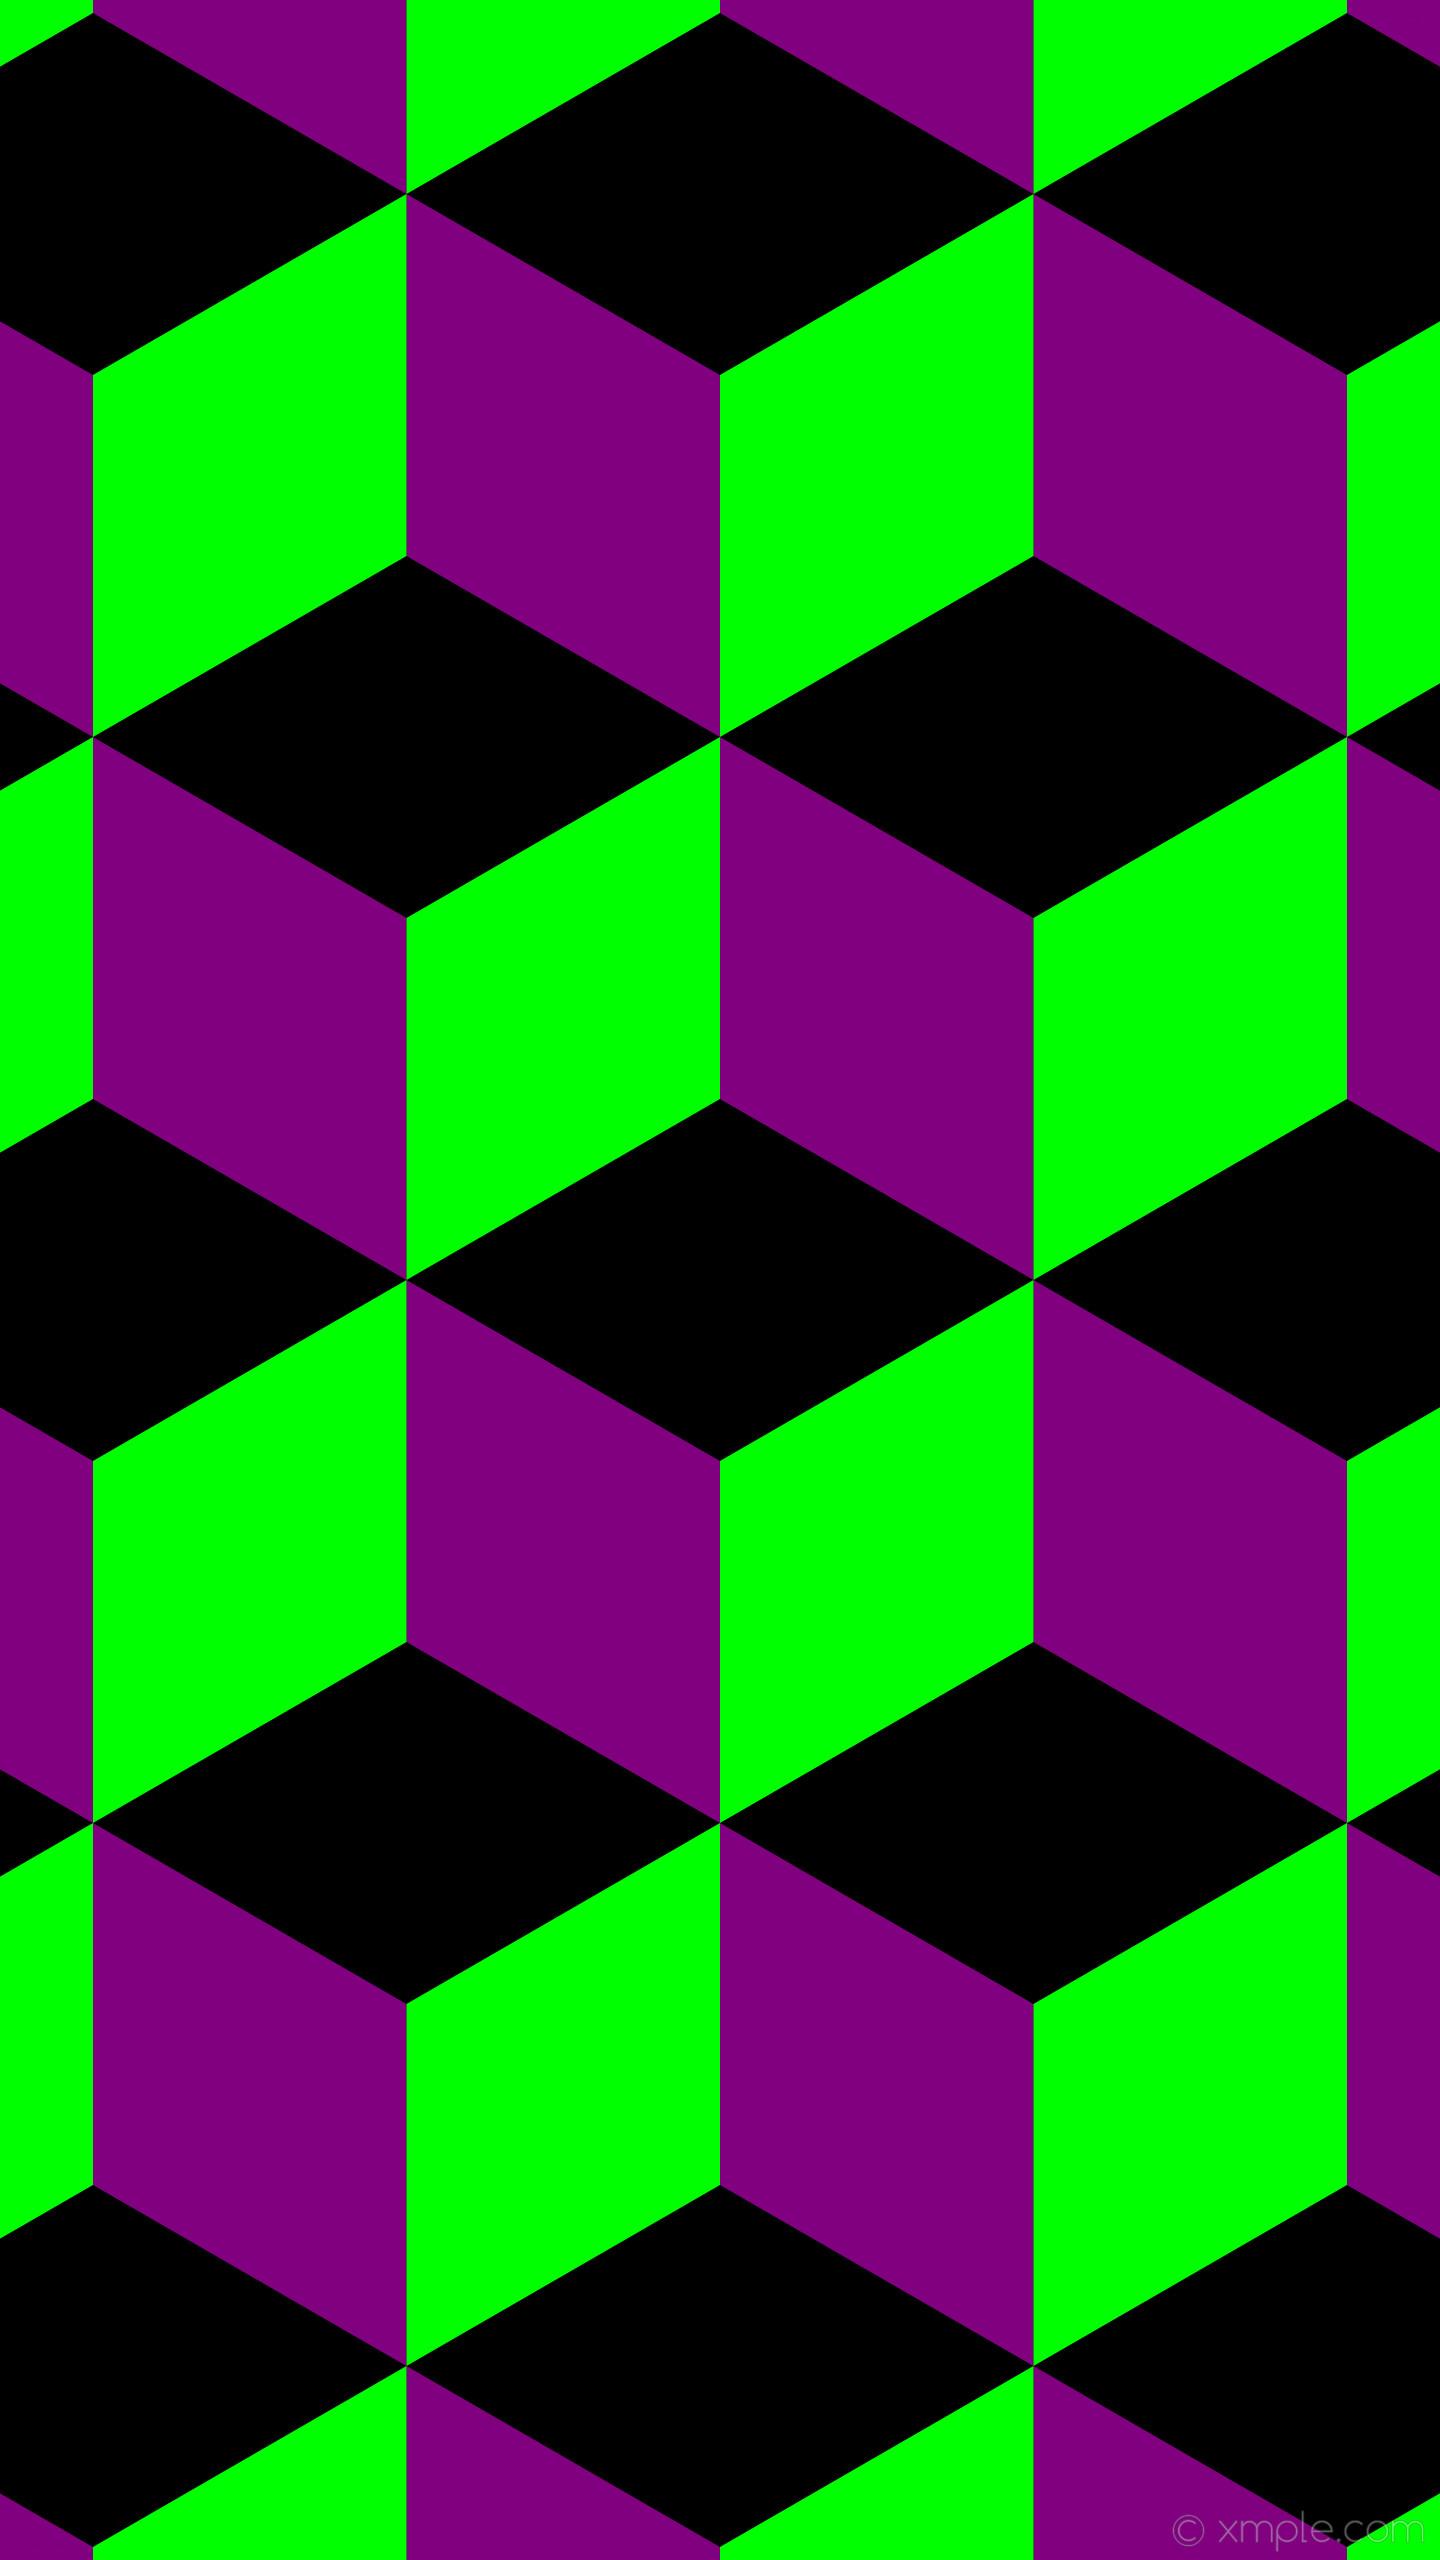 wallpaper green 3d cubes purple black lime #000000 #800080 #00ff00 180°  362px